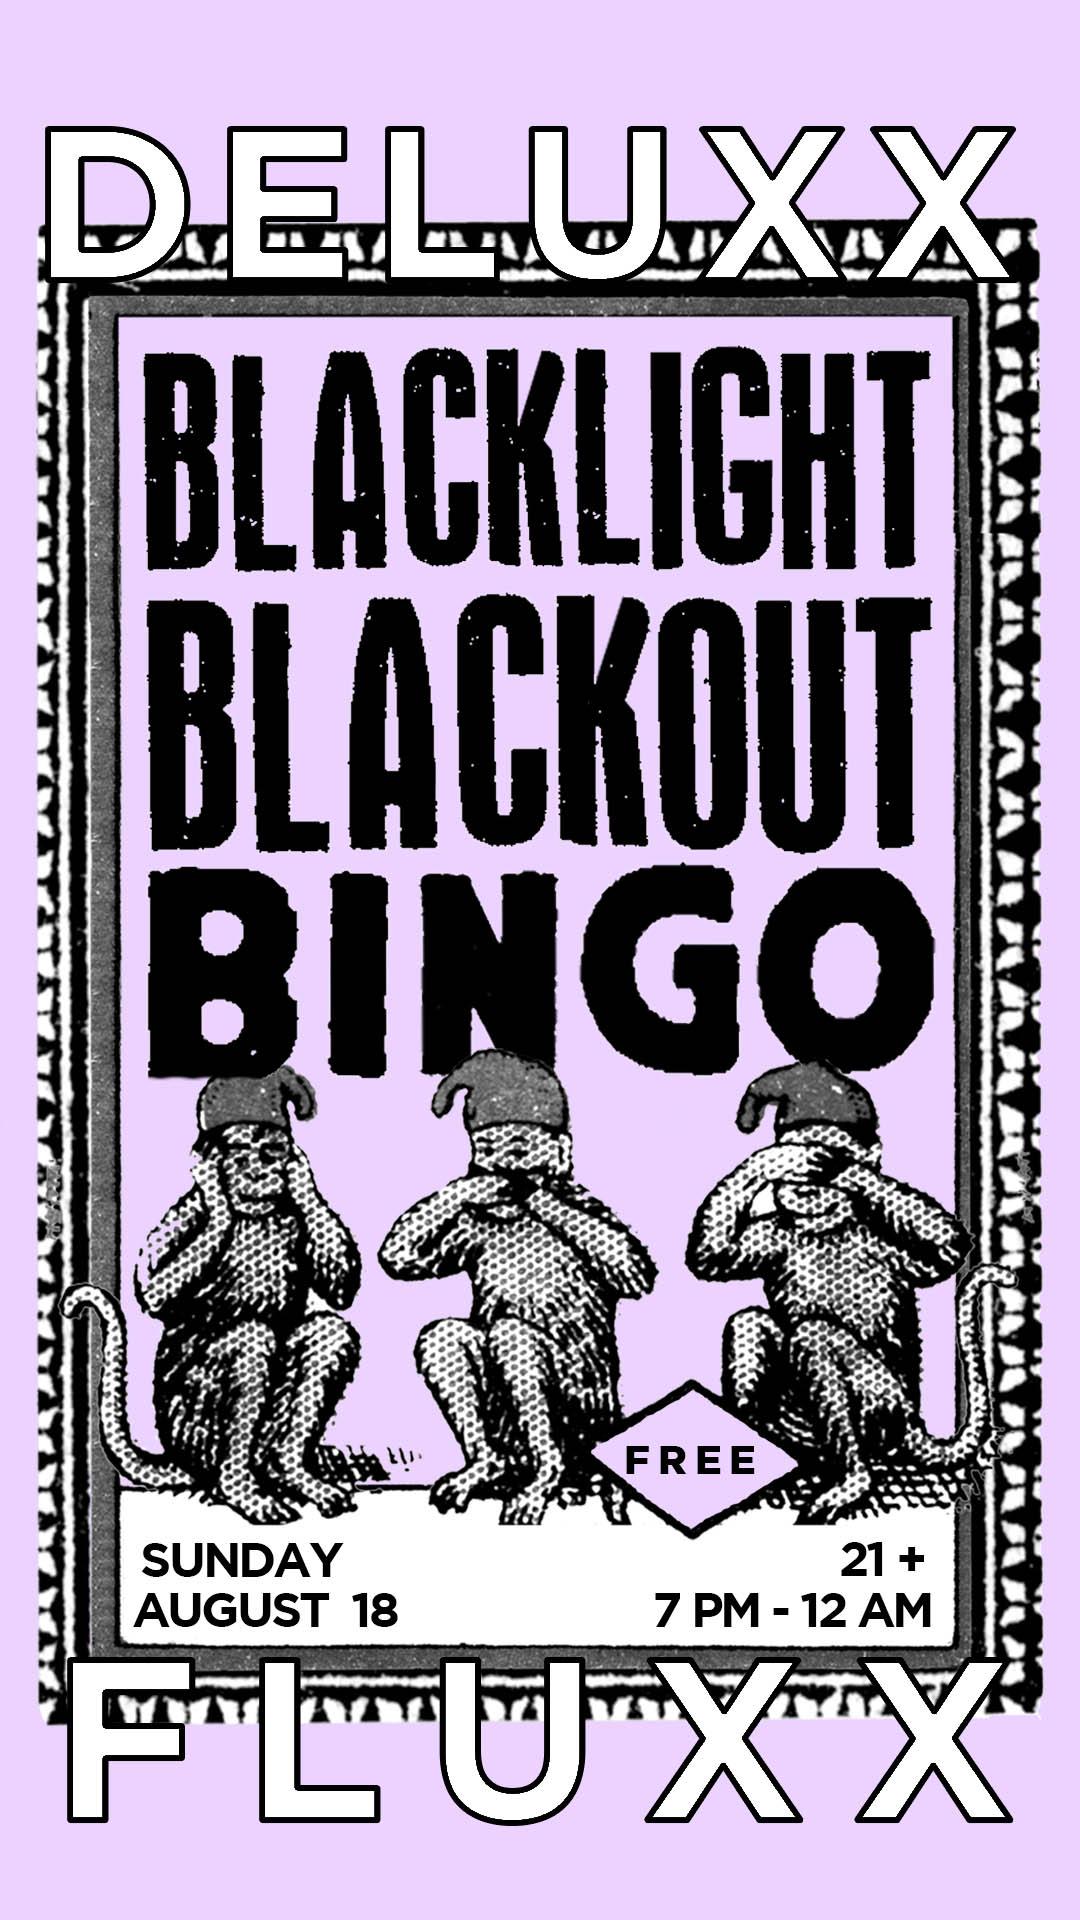 BlacklightBlackoutBingo_IGStory.jpg